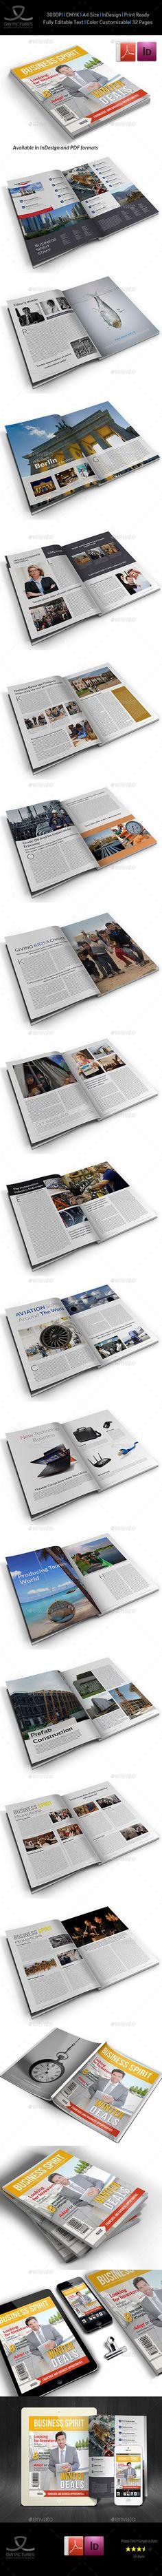 Business Spirit Newsletter Magazine - 32 Pages Template   #magazinetemplate   Download: http://graphicriver.net/item/business-spirit-newsletter-magazine-32-pages-v2/9661881?ref=ksioks